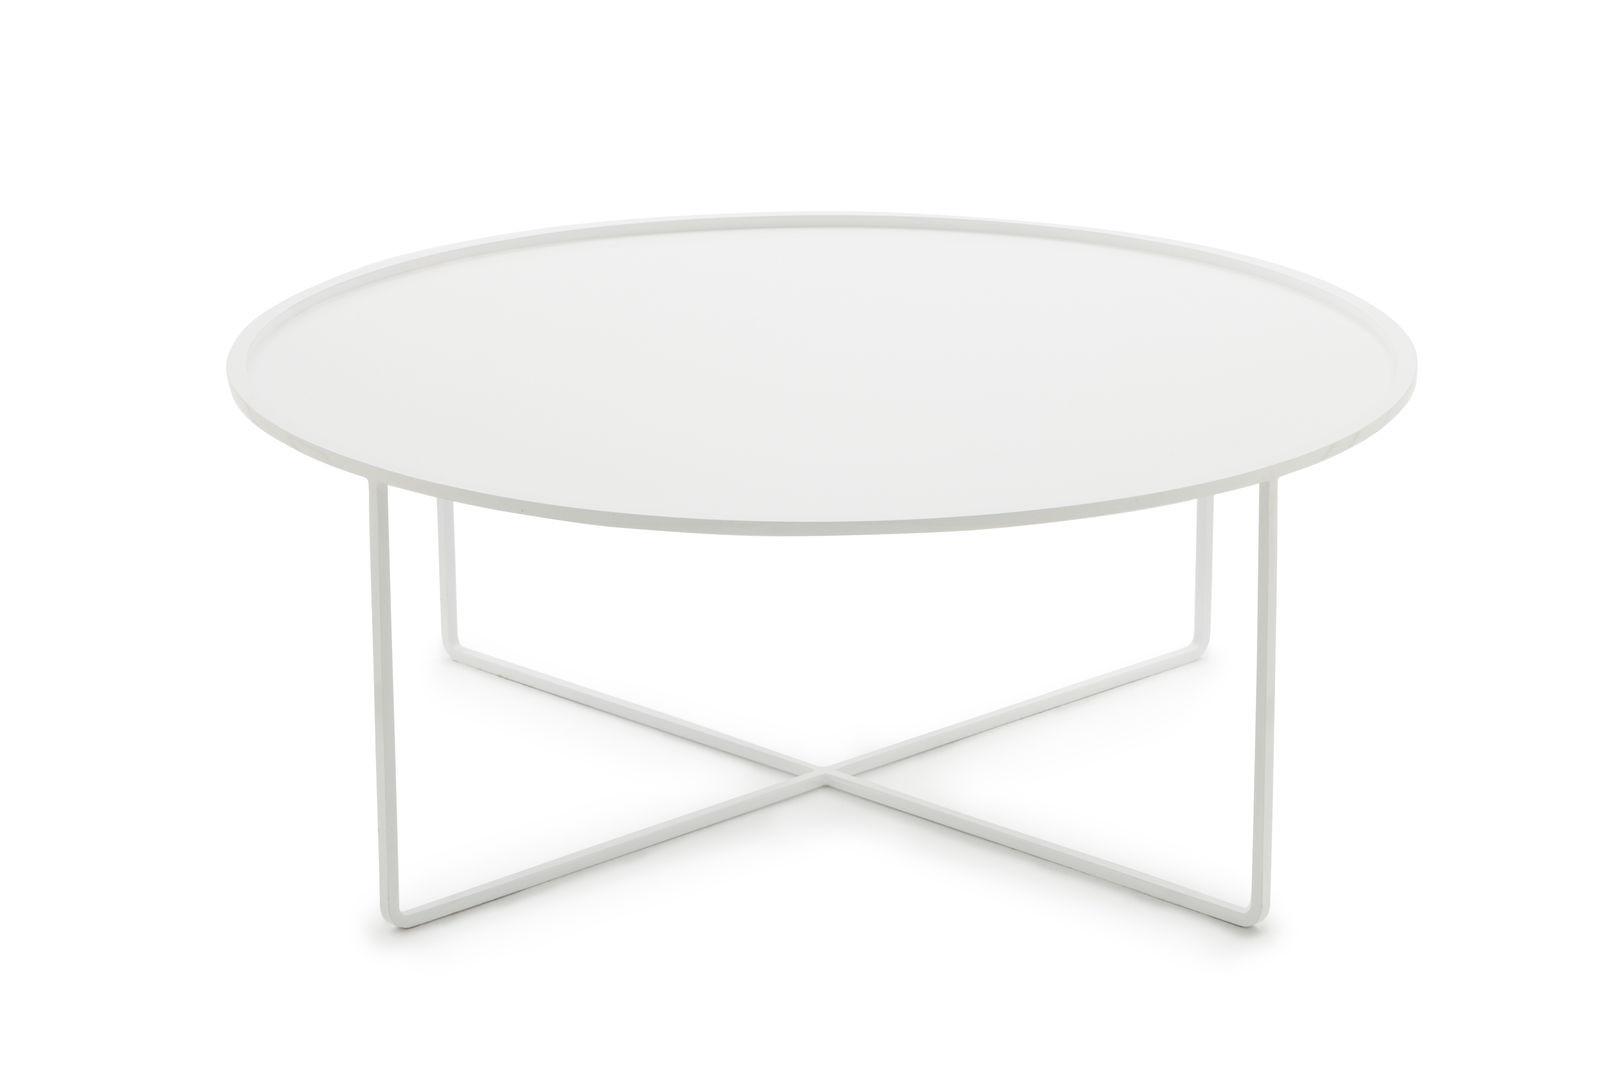 HDM SHORT LEGS TABLE